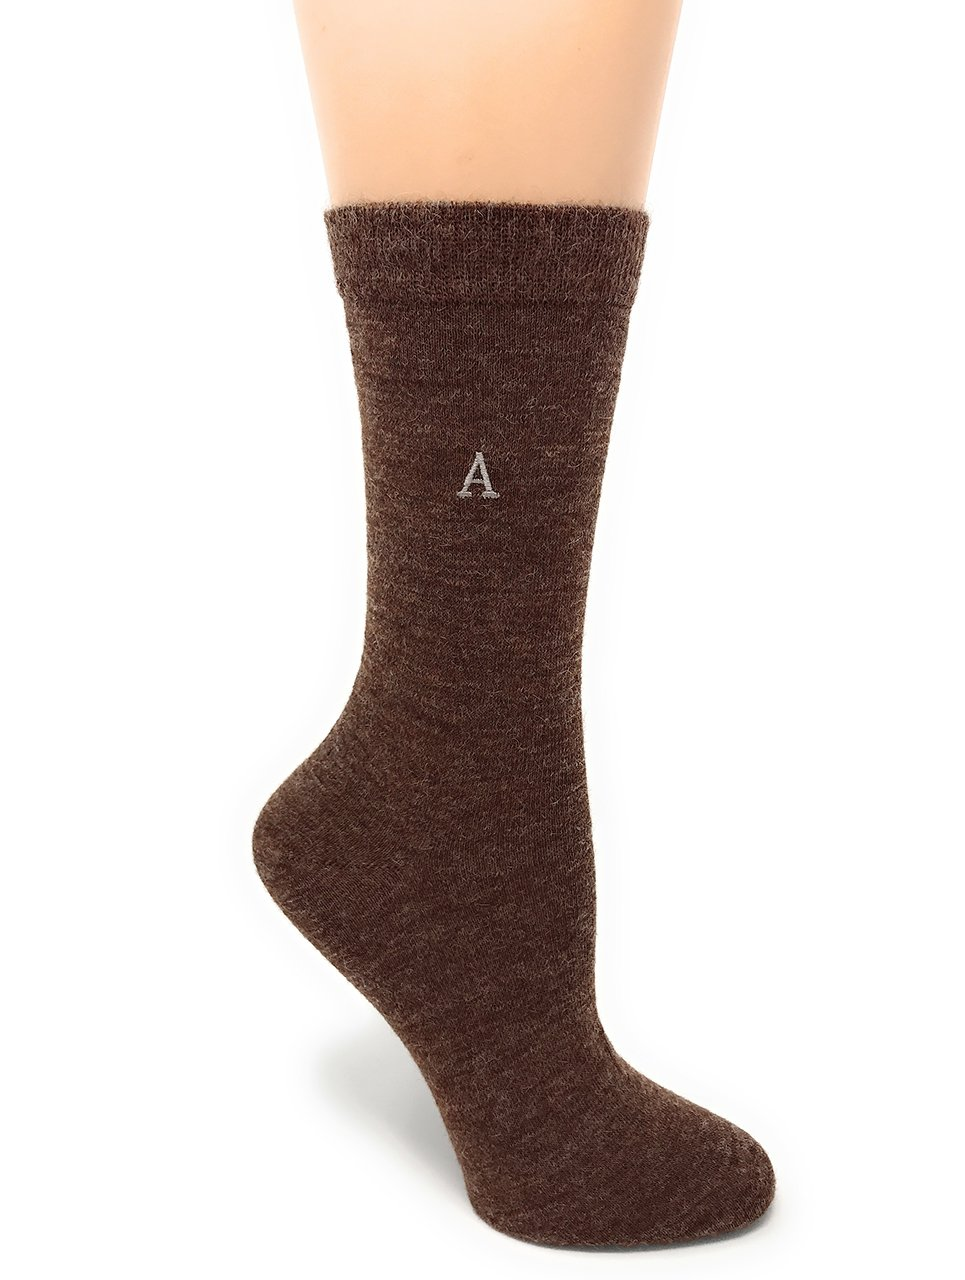 Warrior Alpaca Socks - Women's Trouser Alpaca Socks - Thin yet Warm with wonderful Wicking - Perfect for Spring & Summer (Walnut)